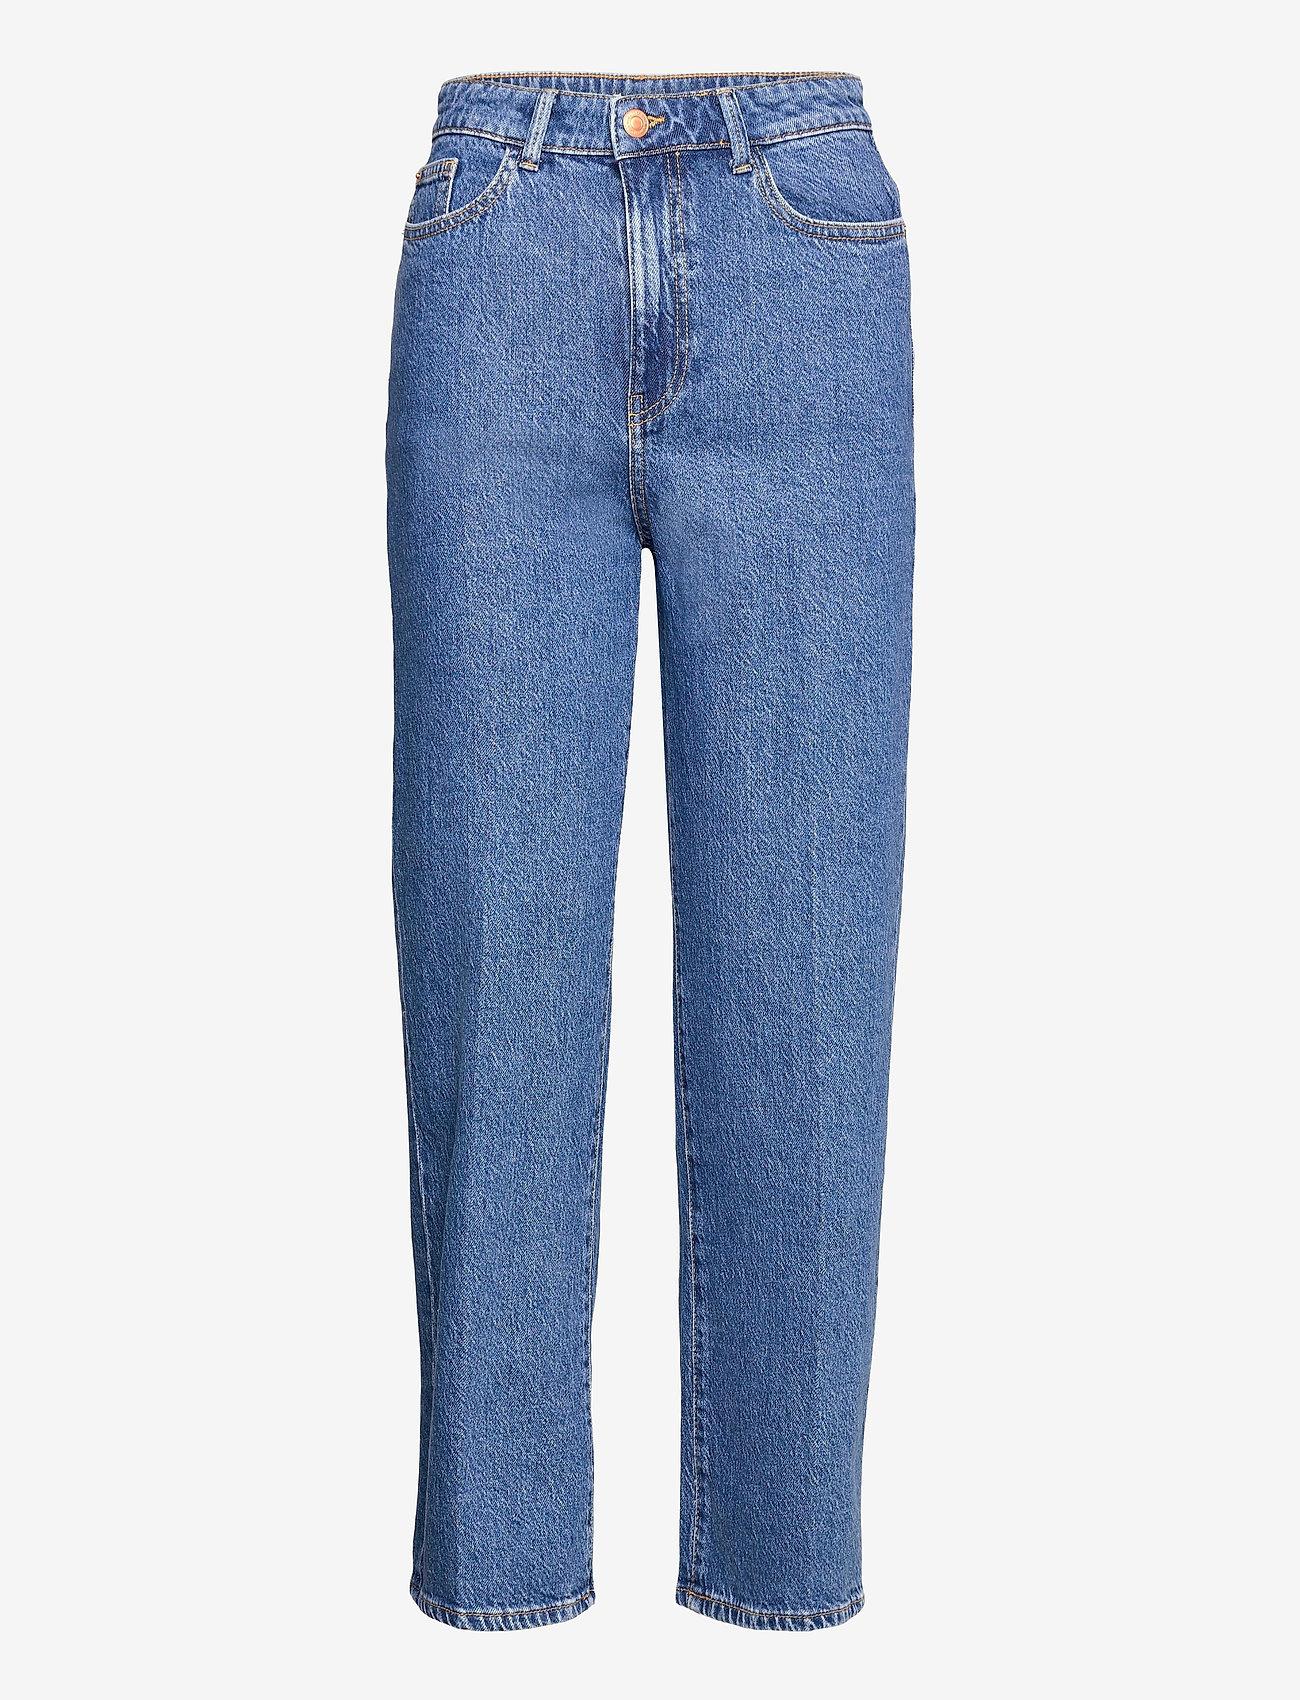 Lindex - Trousers Hanna retro blue - mom jeans - blue - 0